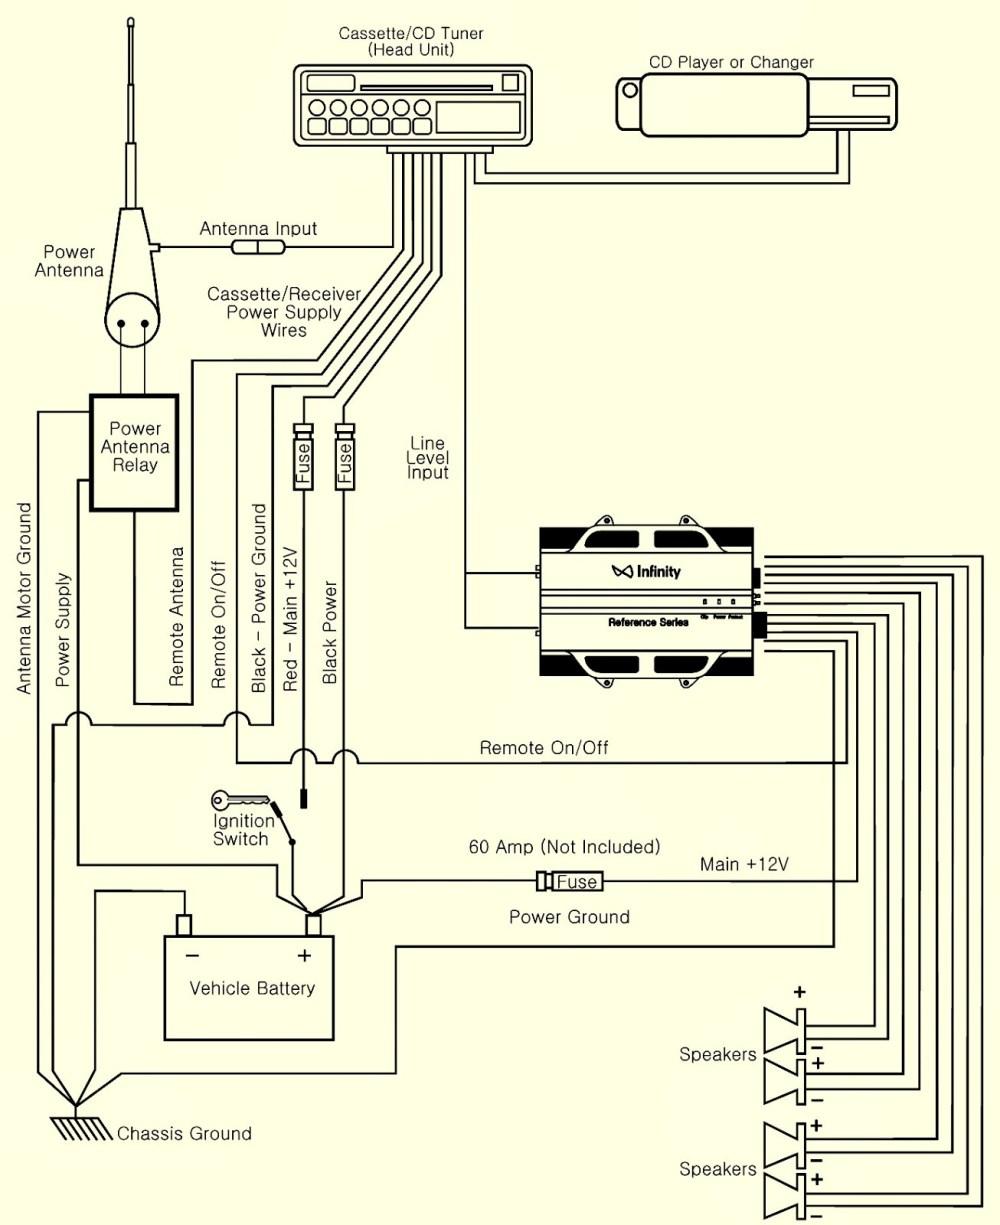 medium resolution of jl audio 12w6v2 wiring diagram free wiring diagram